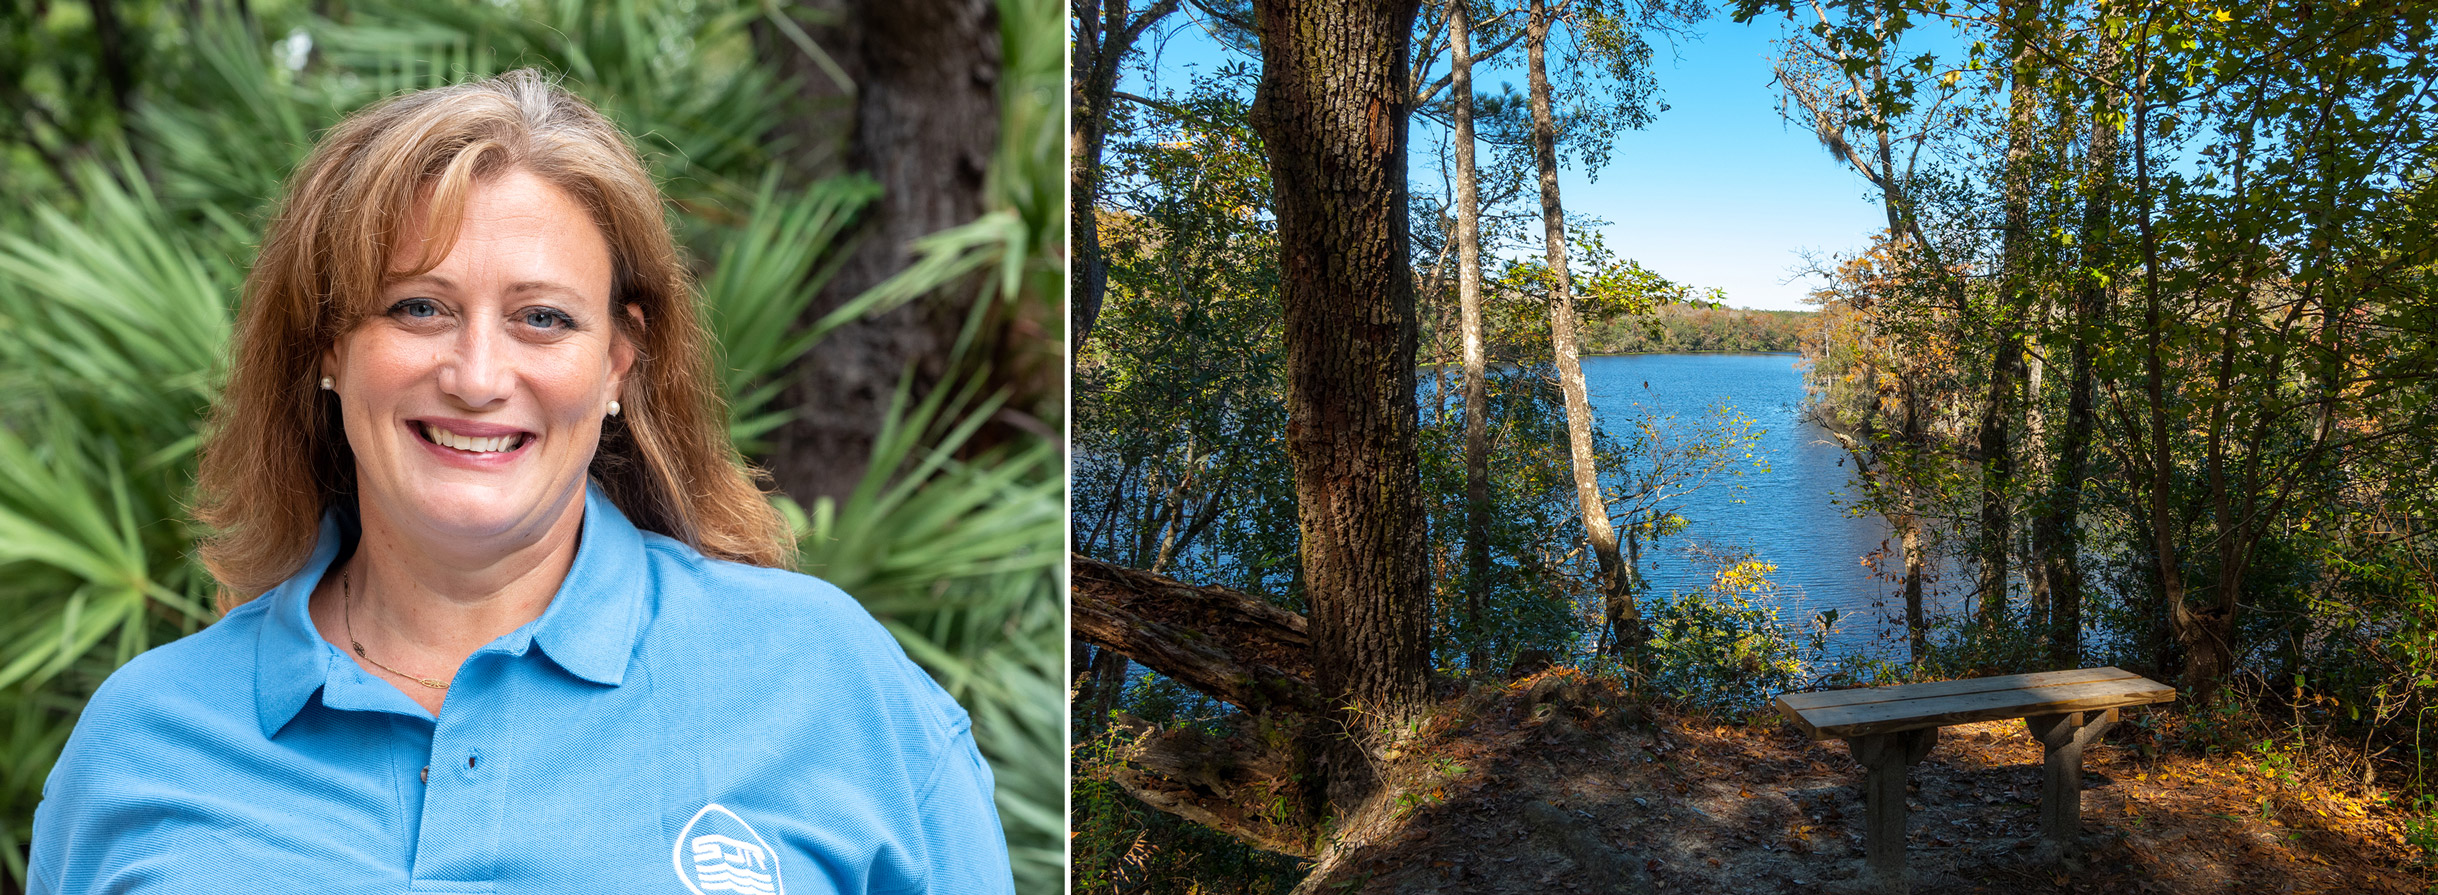 Heather Venter and Black Creek Ravines Conservation Area